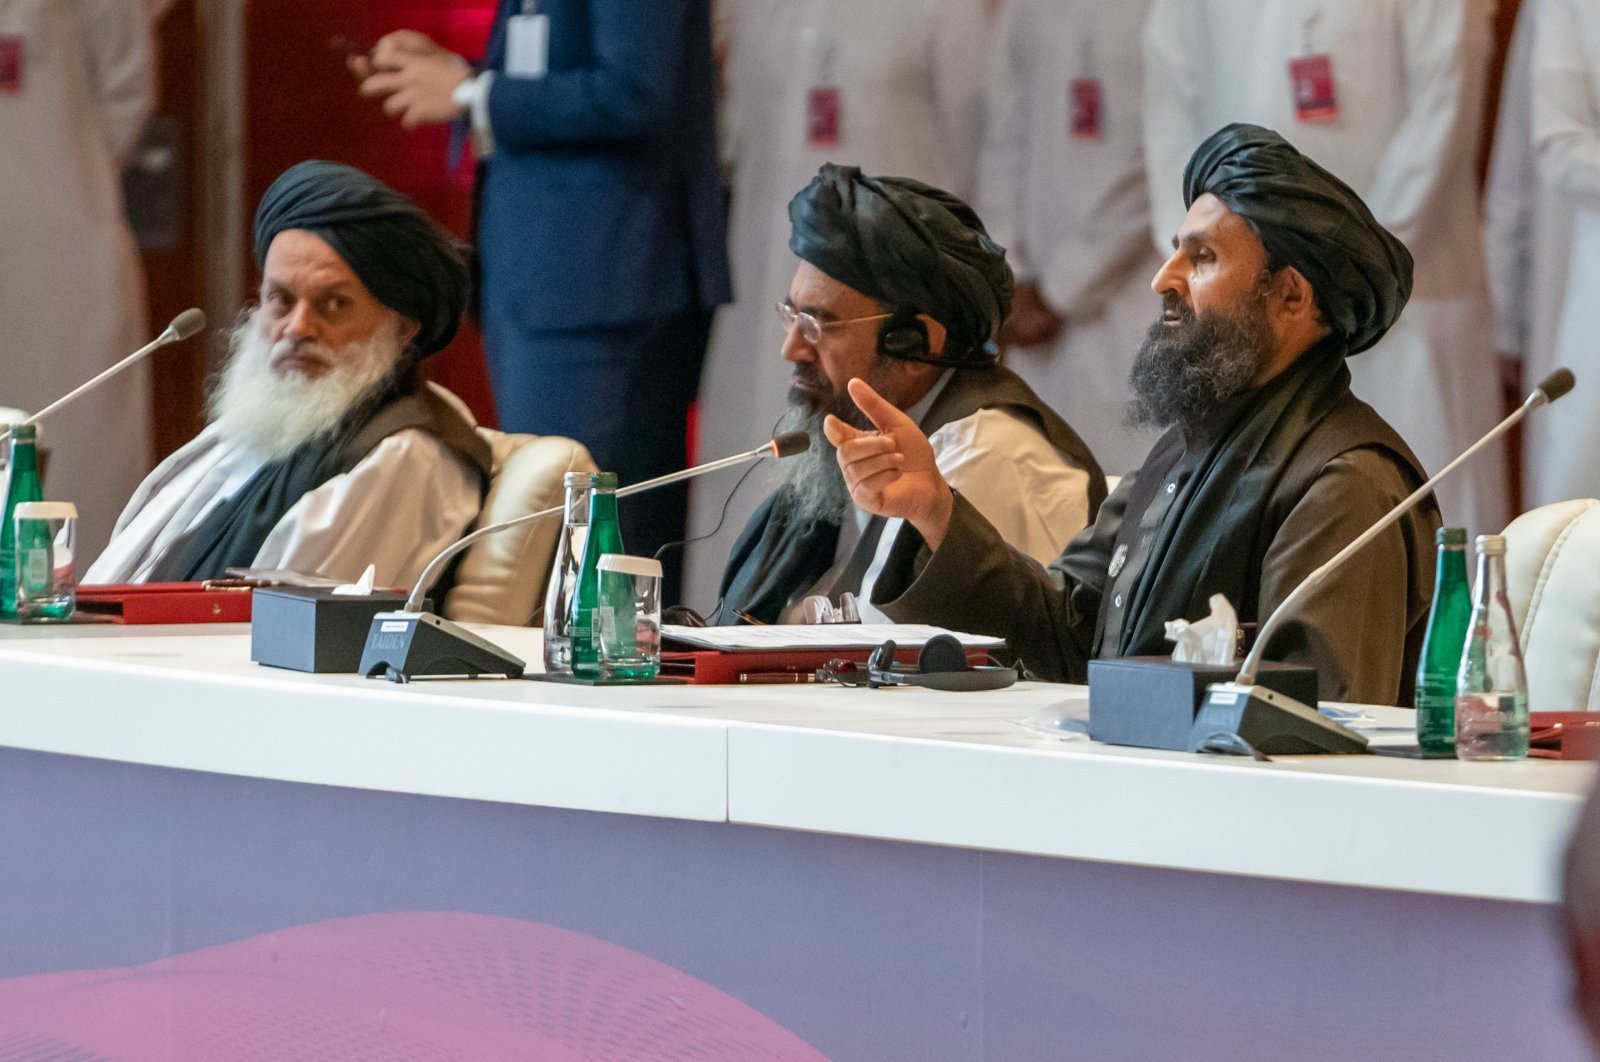 Taliban co-founder Abdul Ghani Baradar speaks during the Afghan peace negotiations, Doha, Qatar, Sept. 12, 2020. (AA Photo)